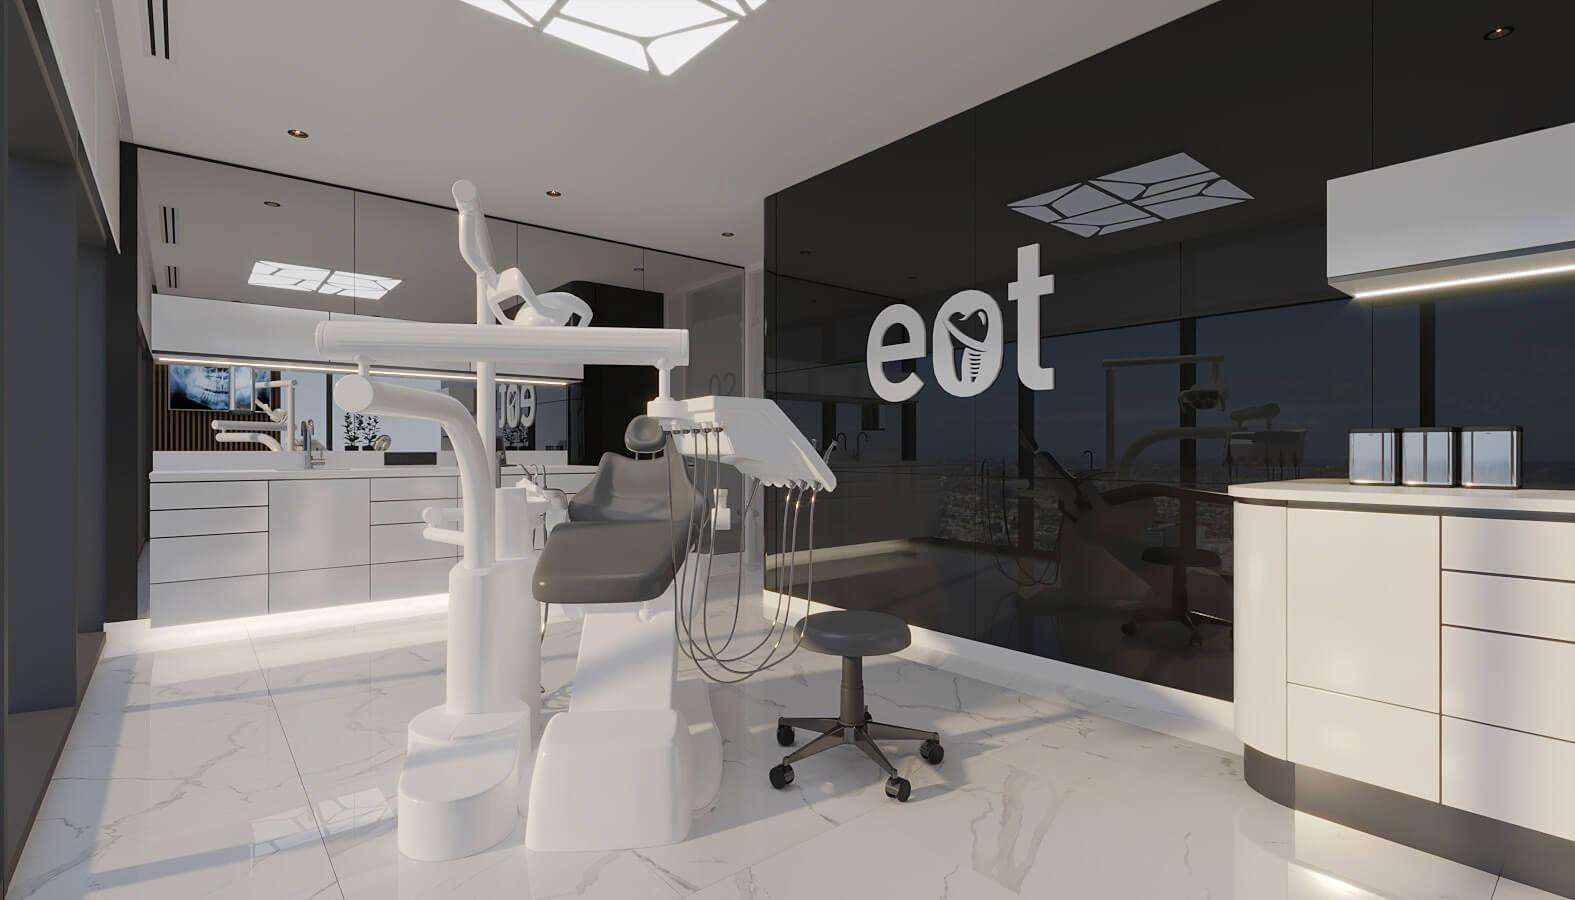 clinic 4524 EOT Dental Clinic Healthcare